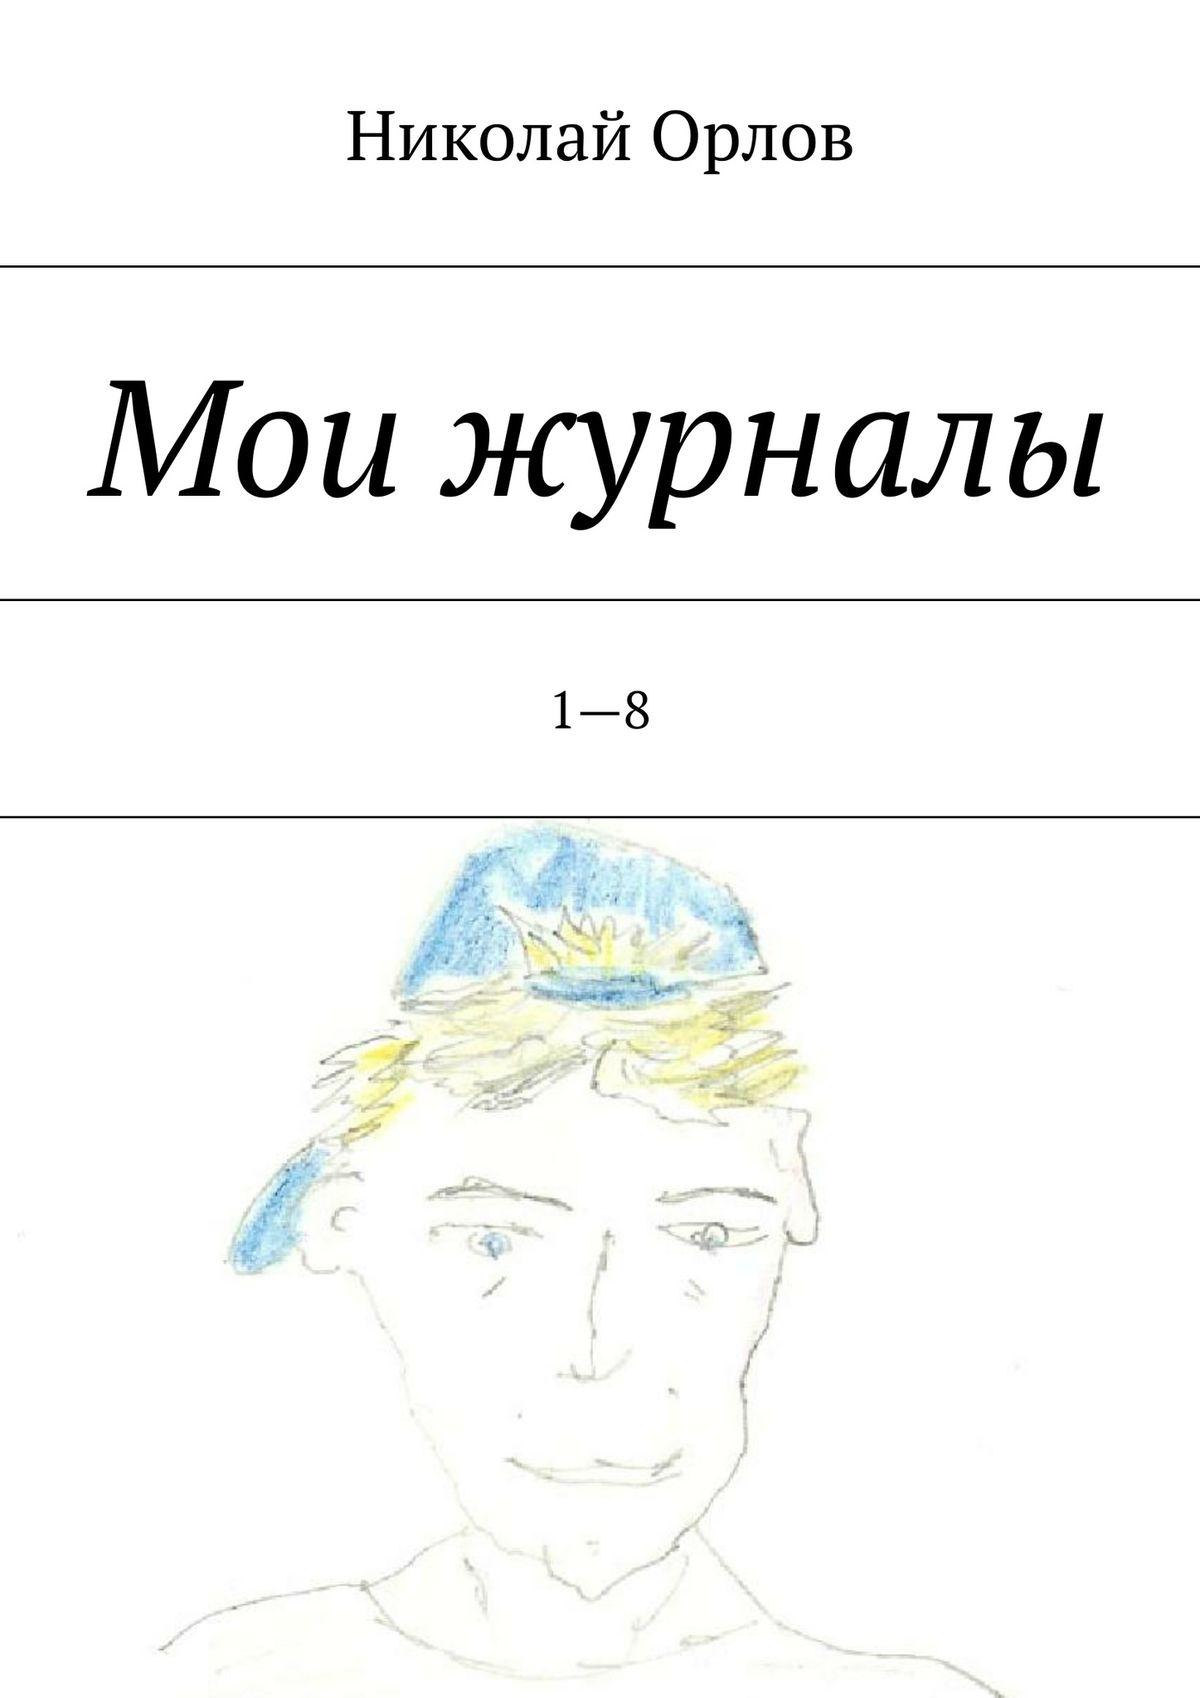 Николай Орлов Мои журналы.1—8 сергей орлов сергей орлов стихотворения